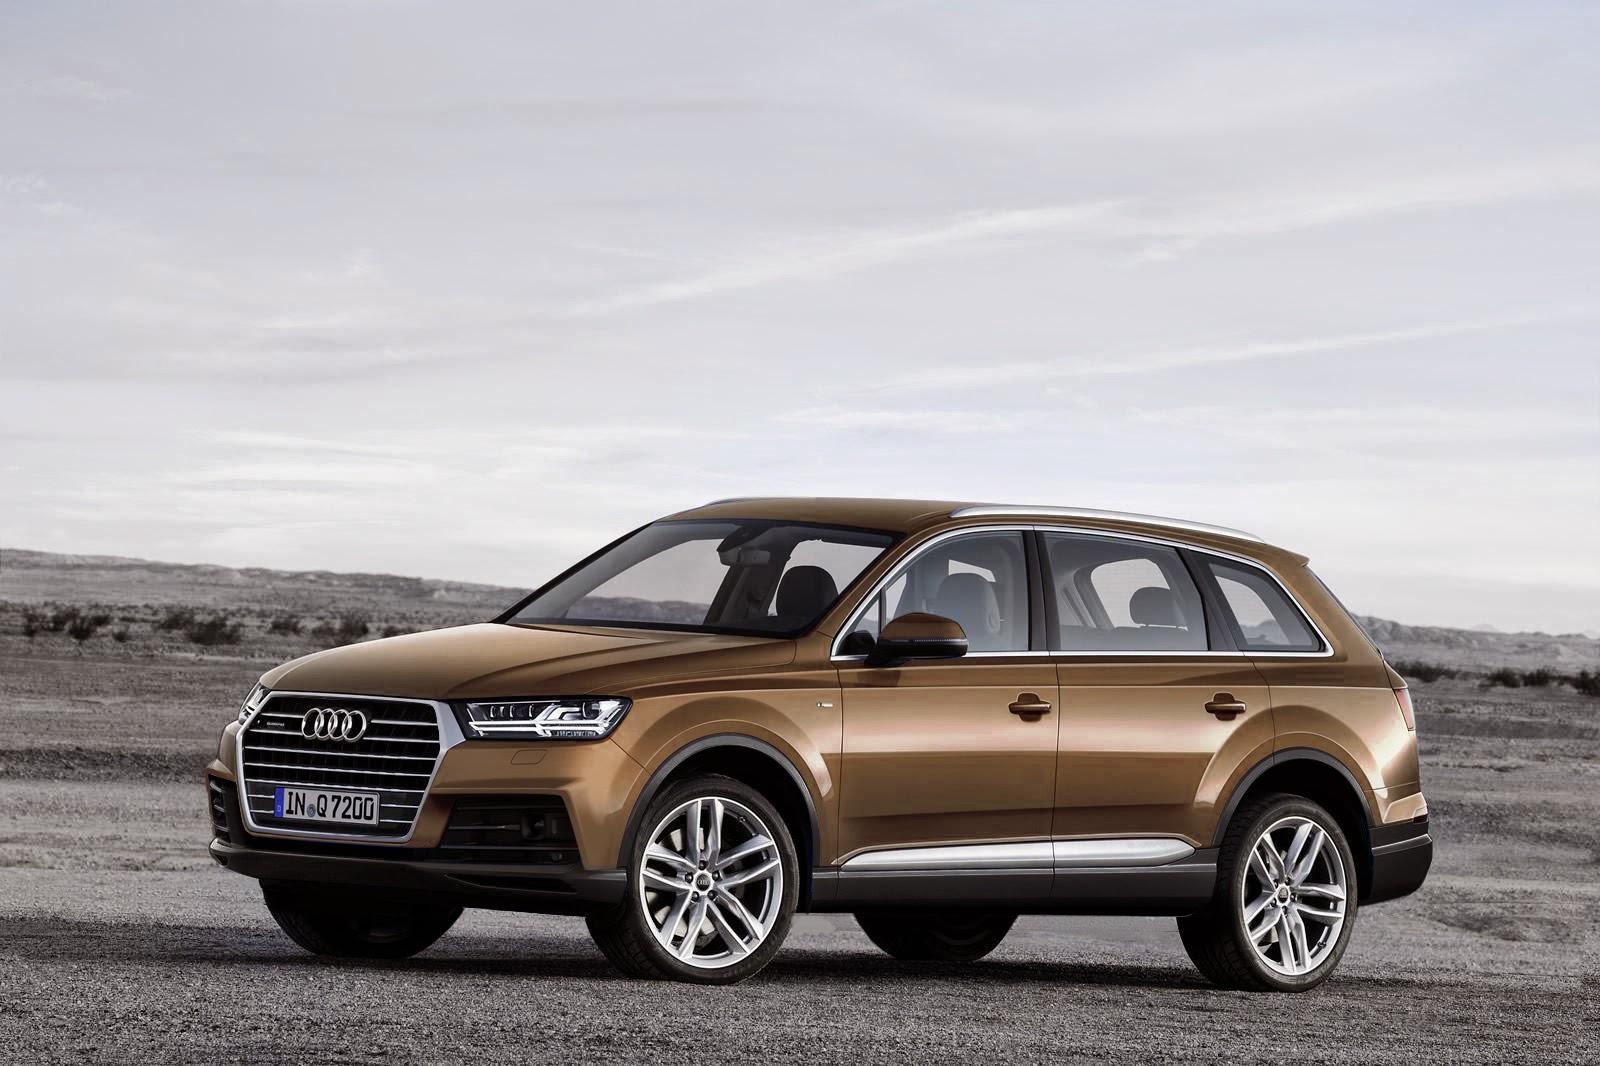 Audi q7 ground clearance